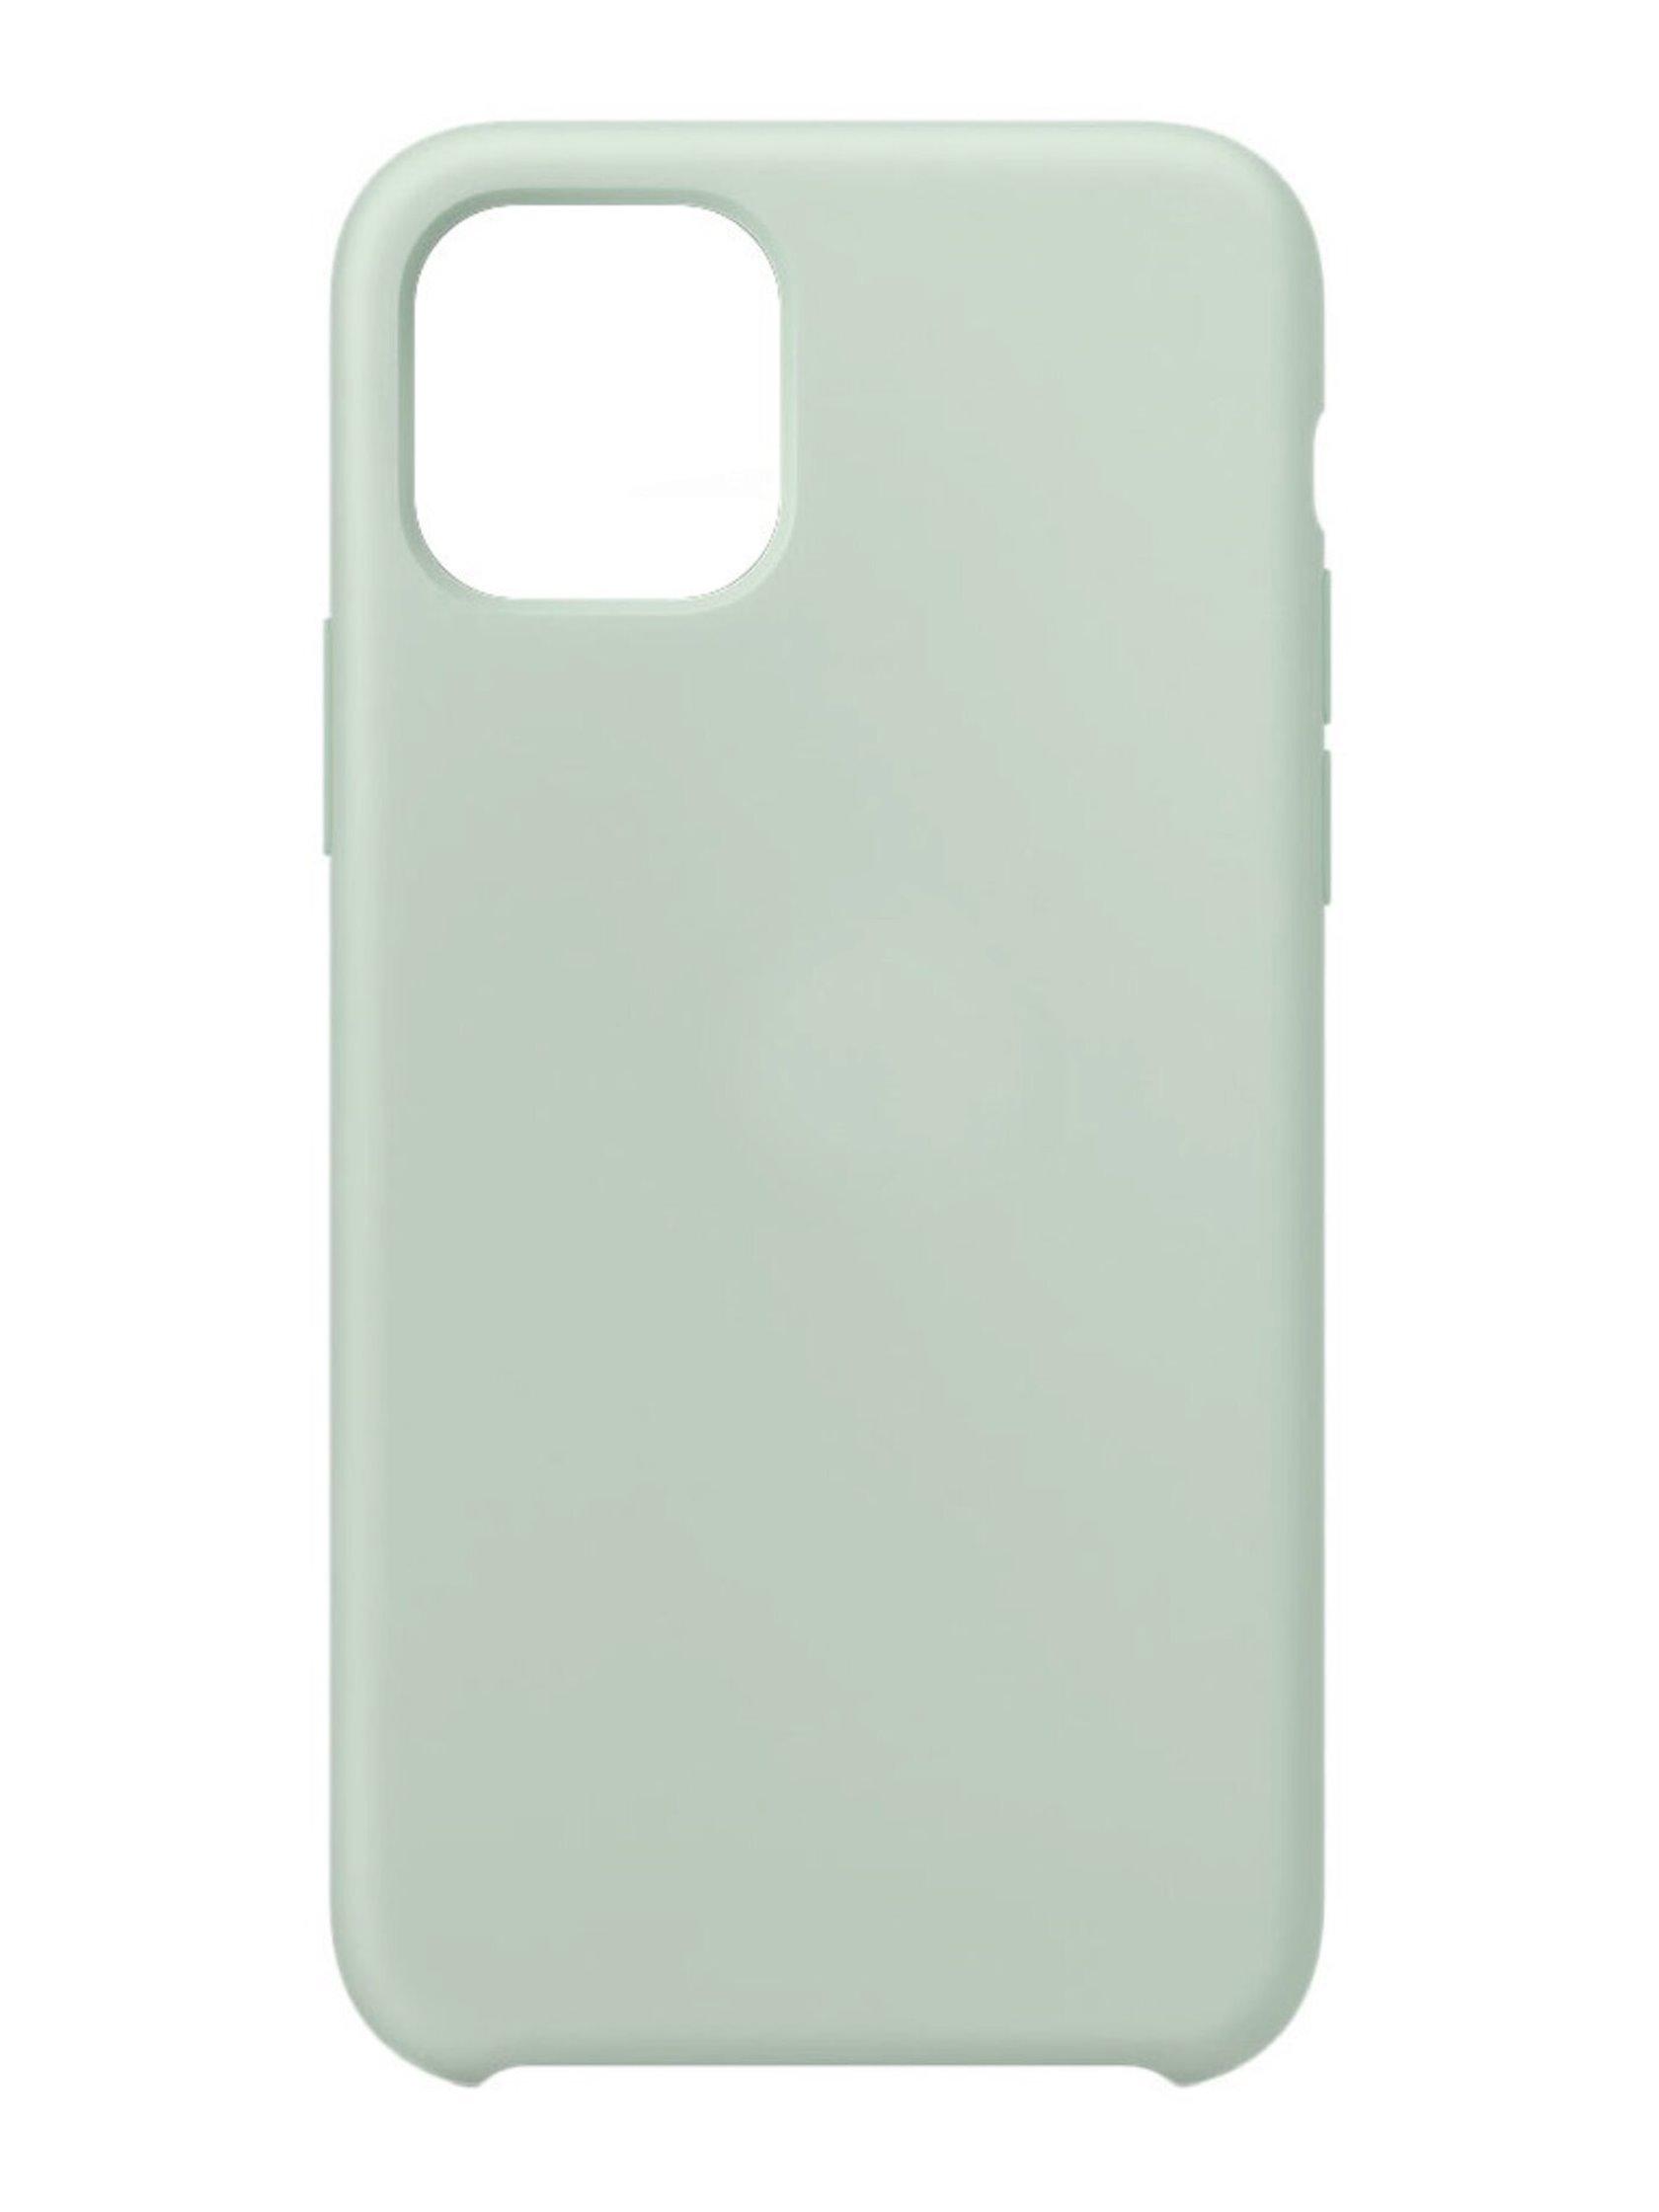 Çexol Silicone Case Apple iPhone 11 Pro Max üçün Silicone Case Beryl